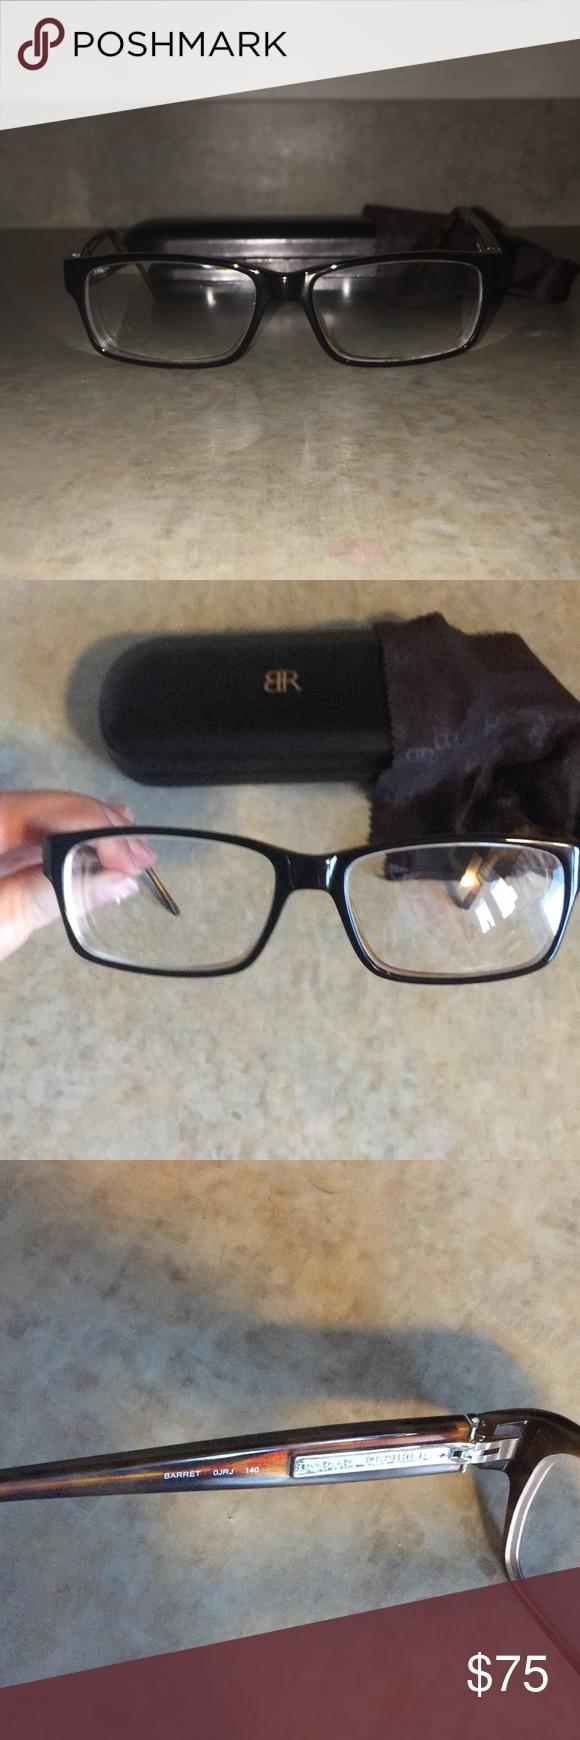 Banana Republic Glasses | Banana republic, Prescription lenses and ...